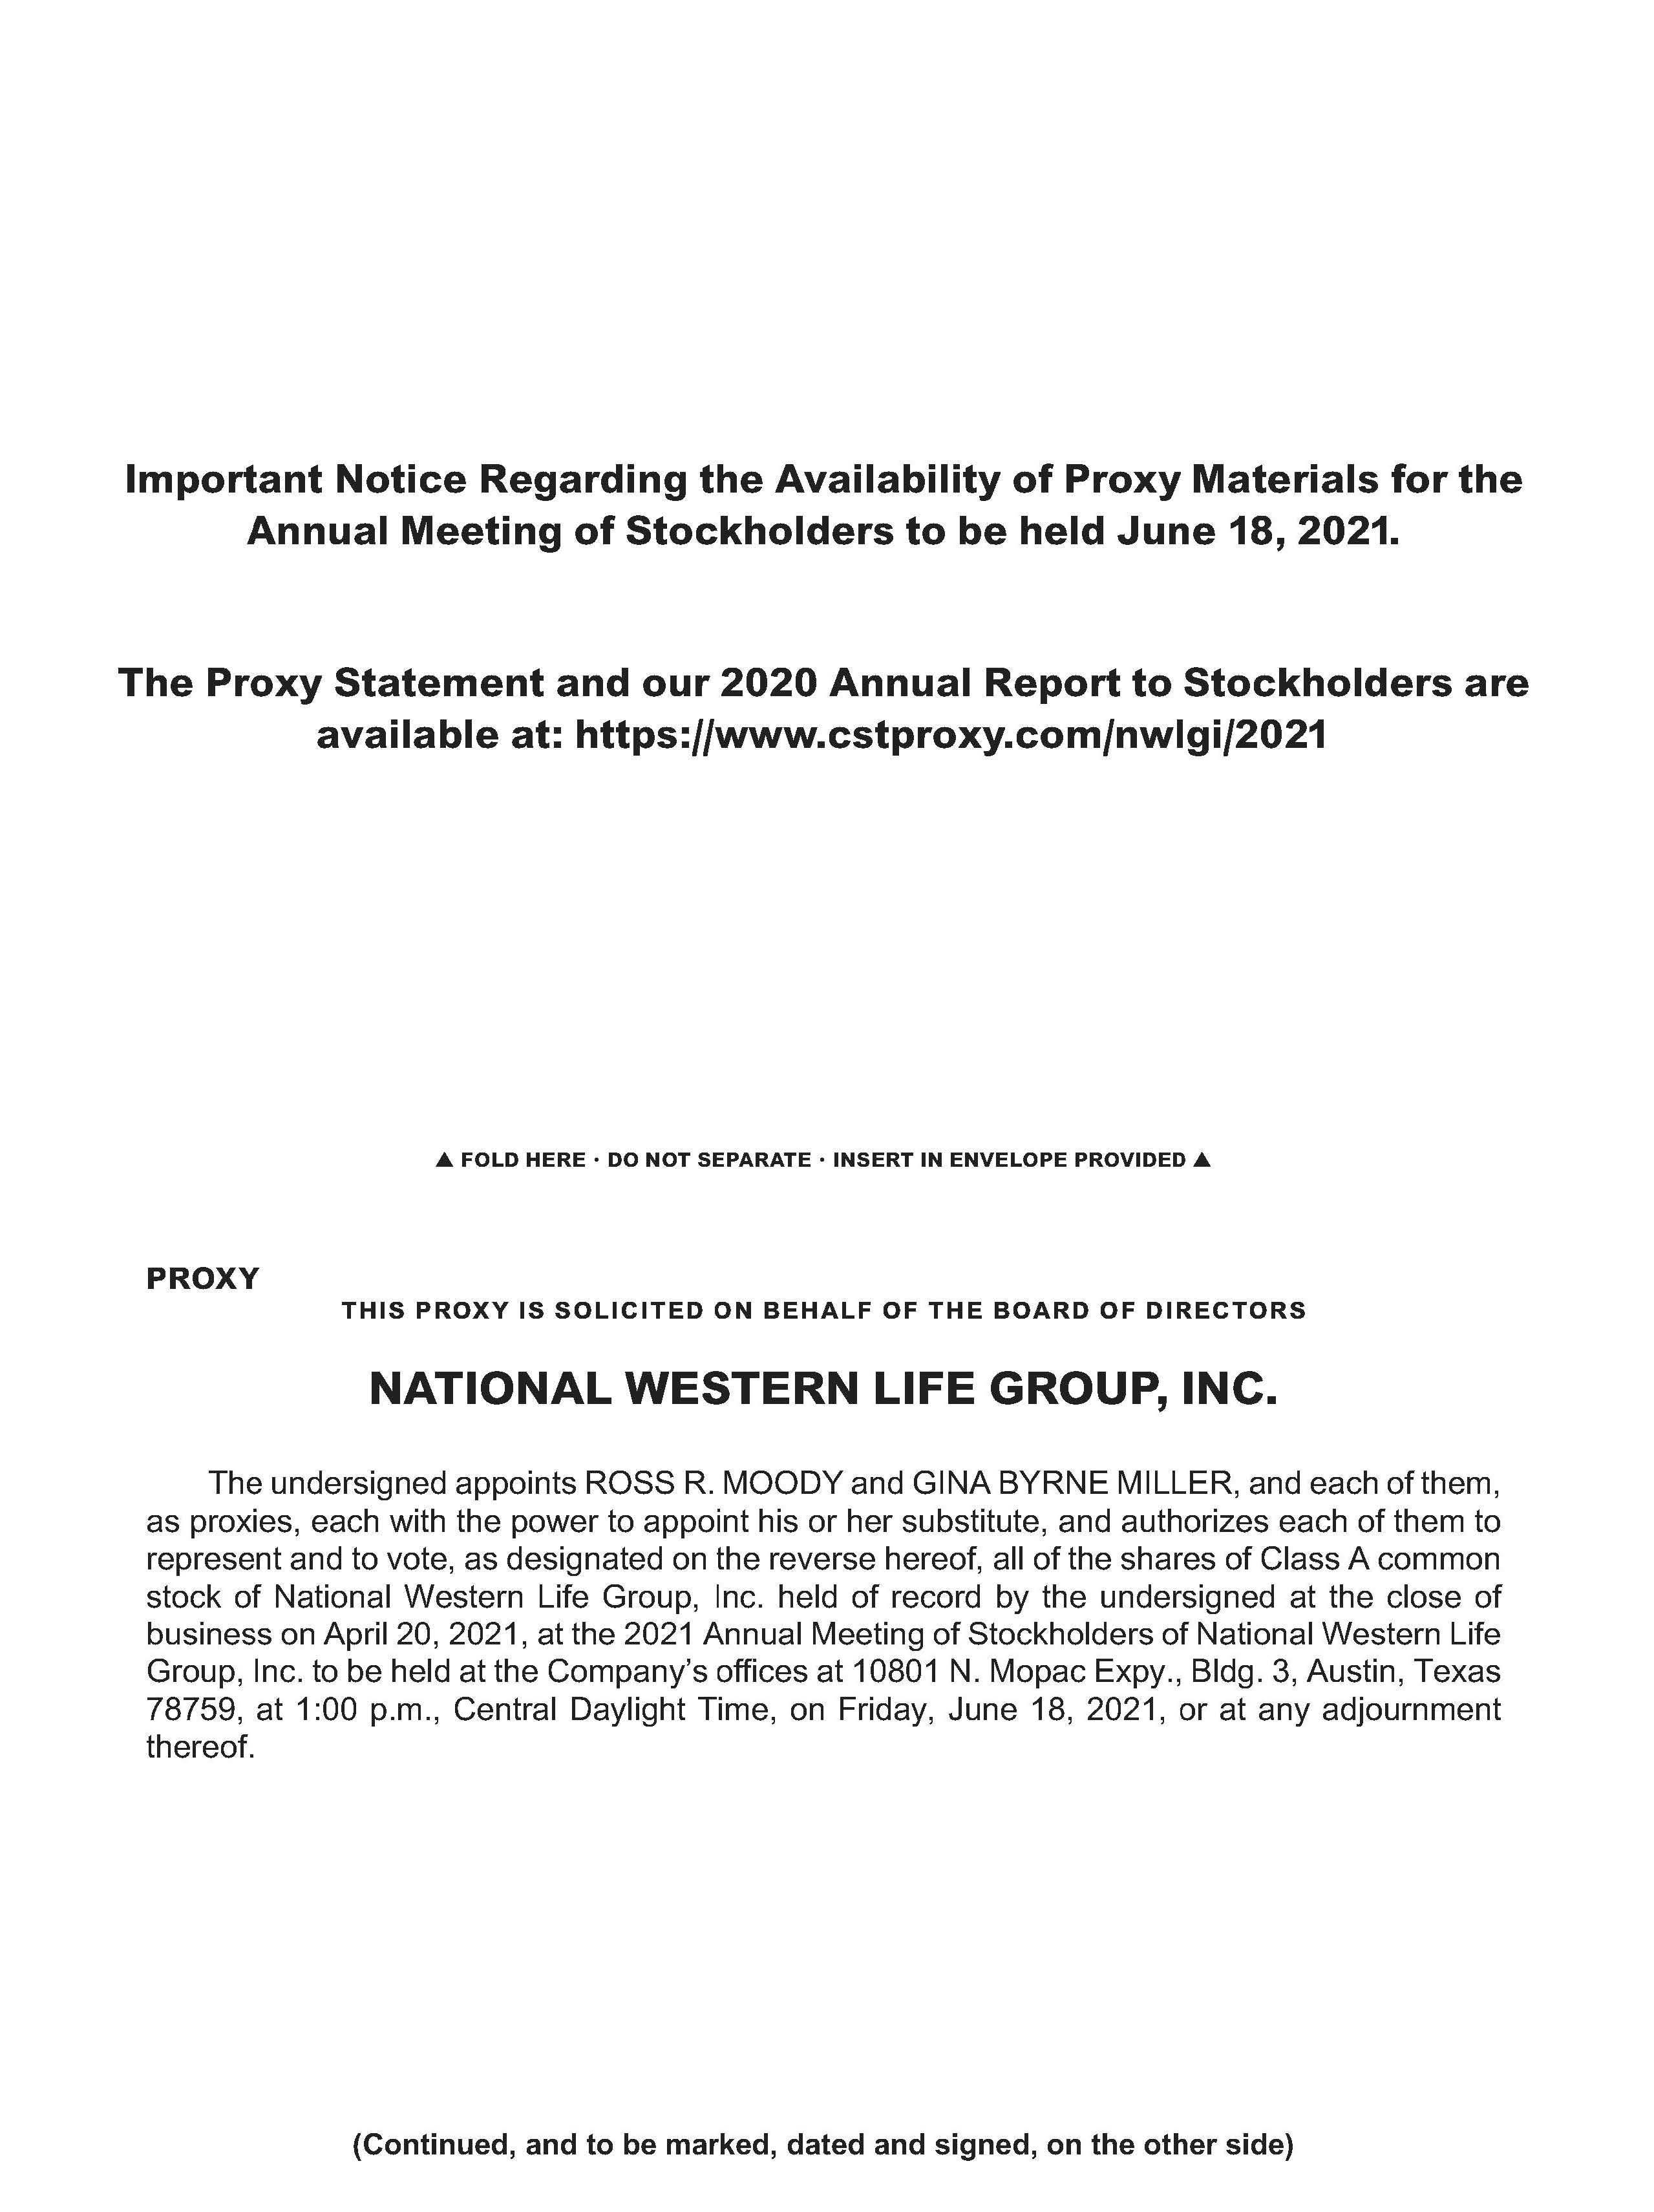 NATIONALWESTERNPROXYCLASSAC.JPG